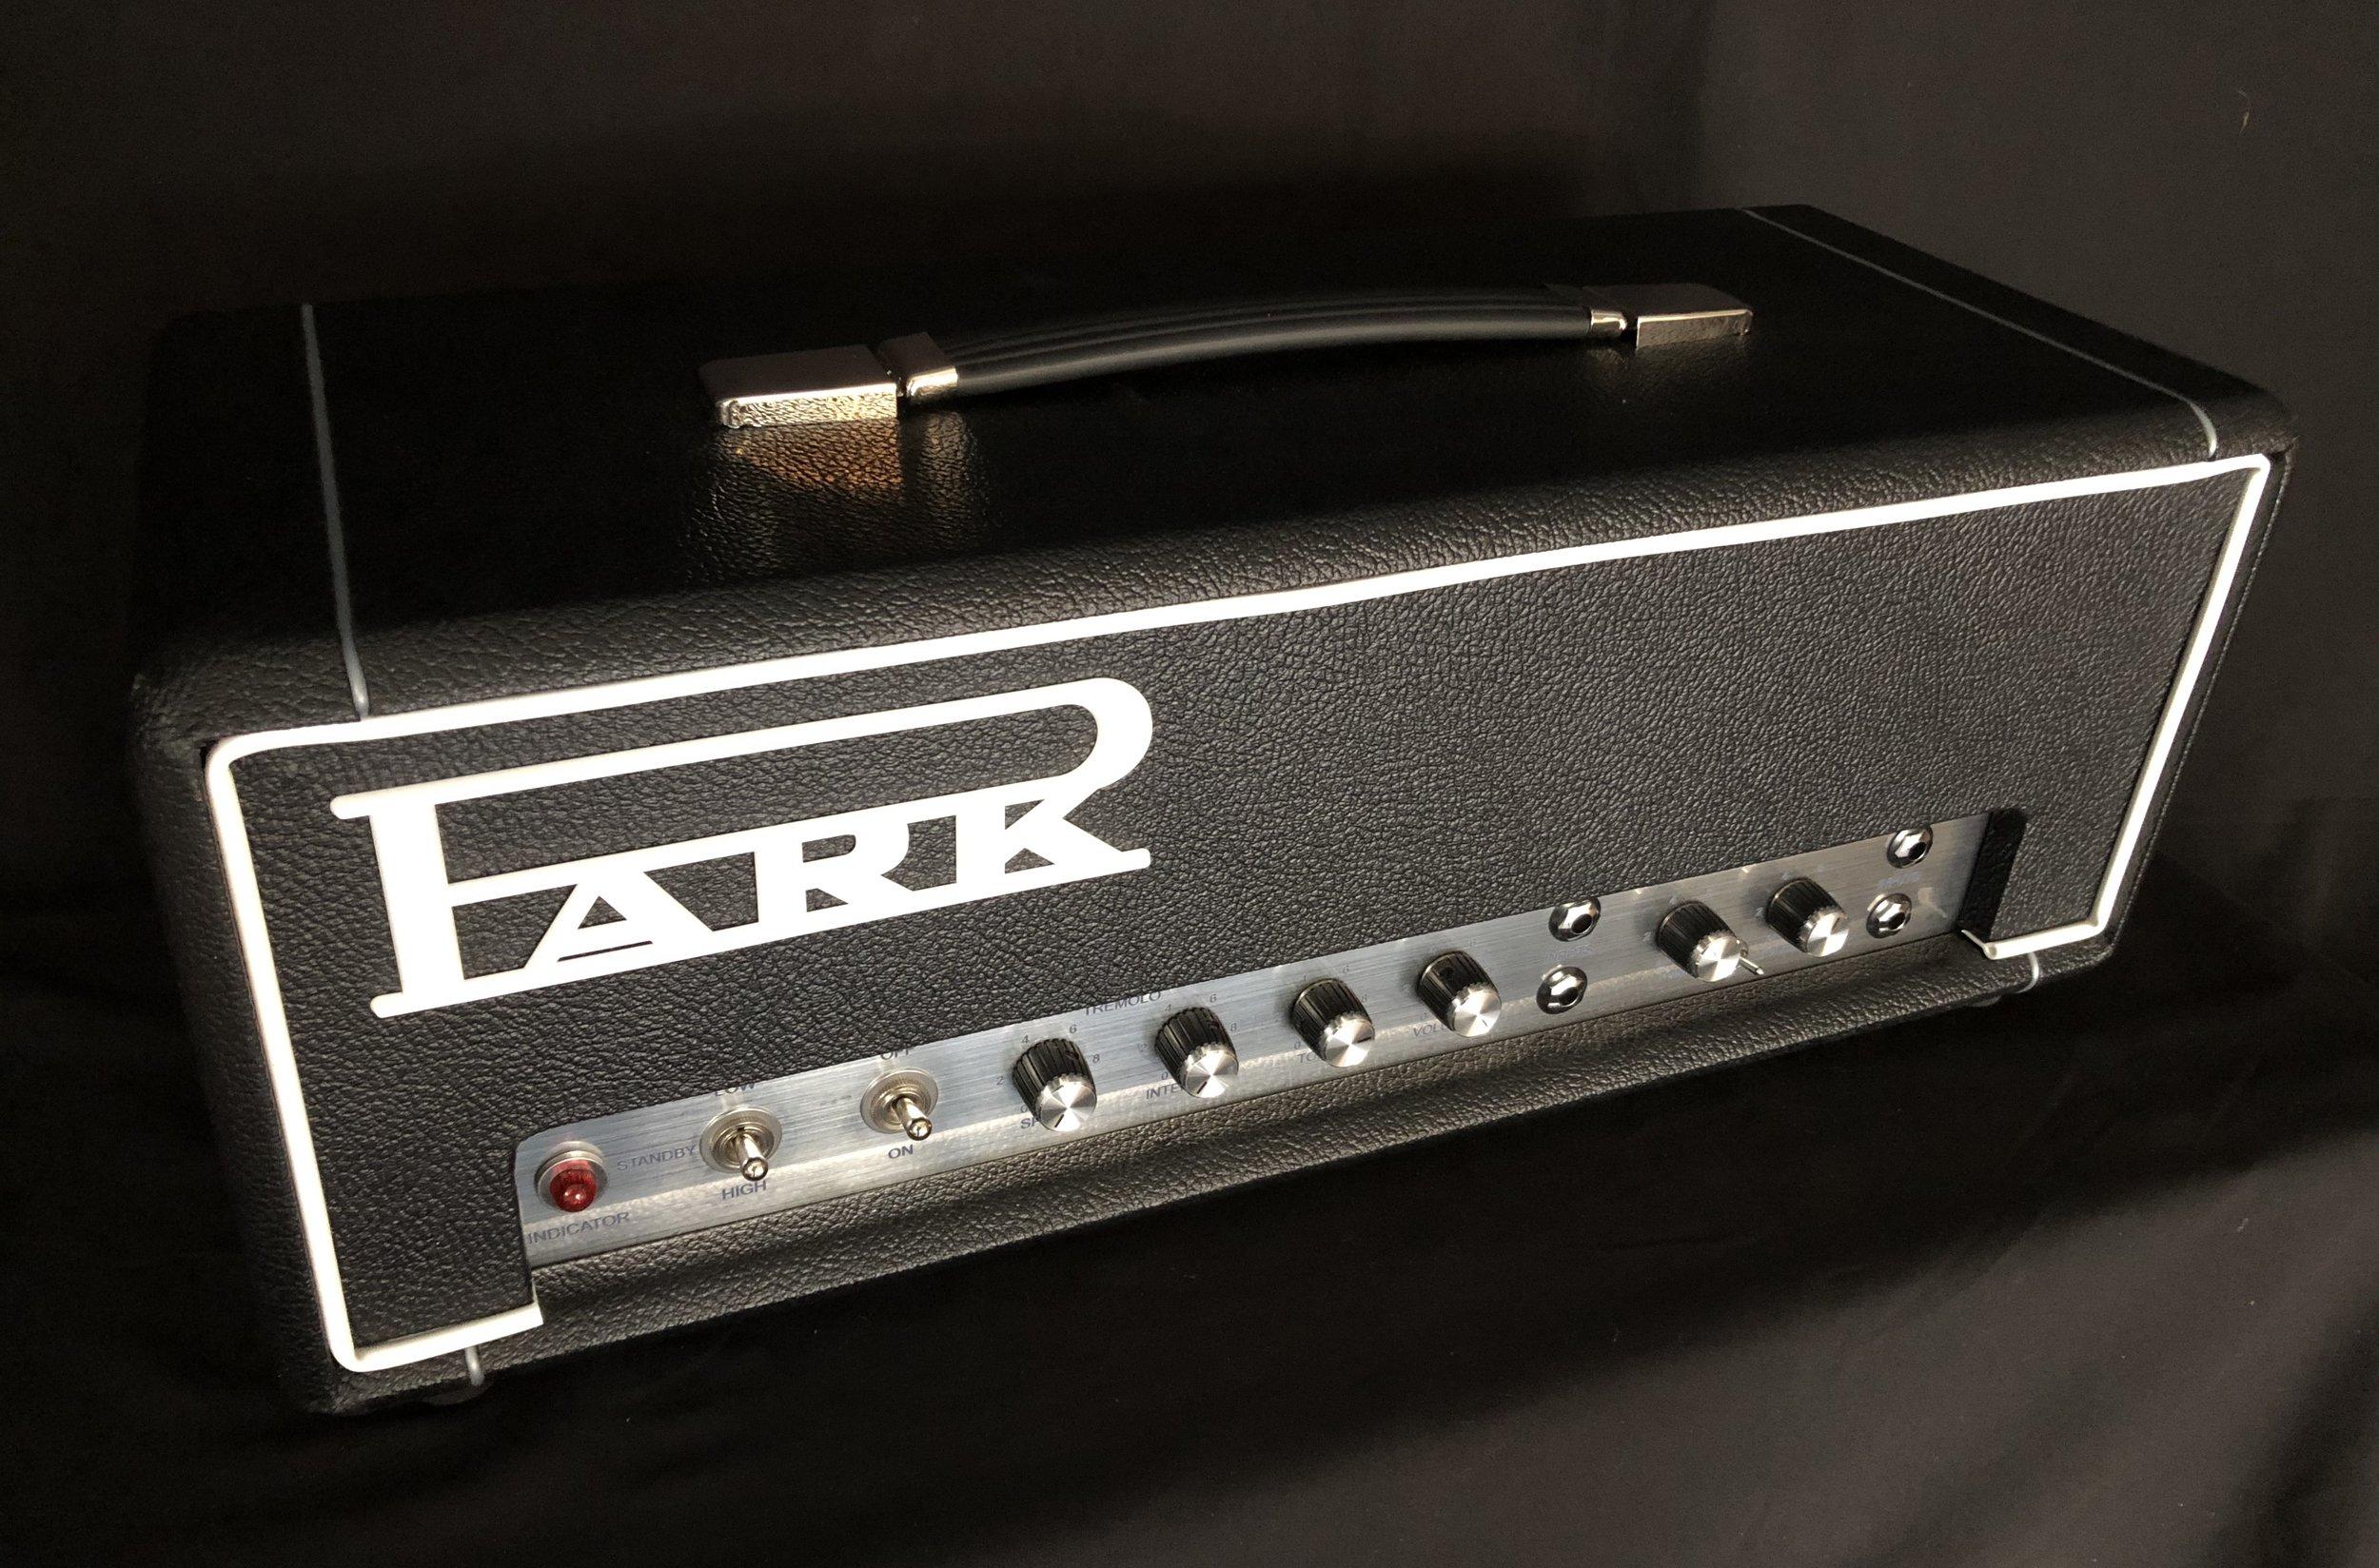 Park P1800H compact 18 watt head